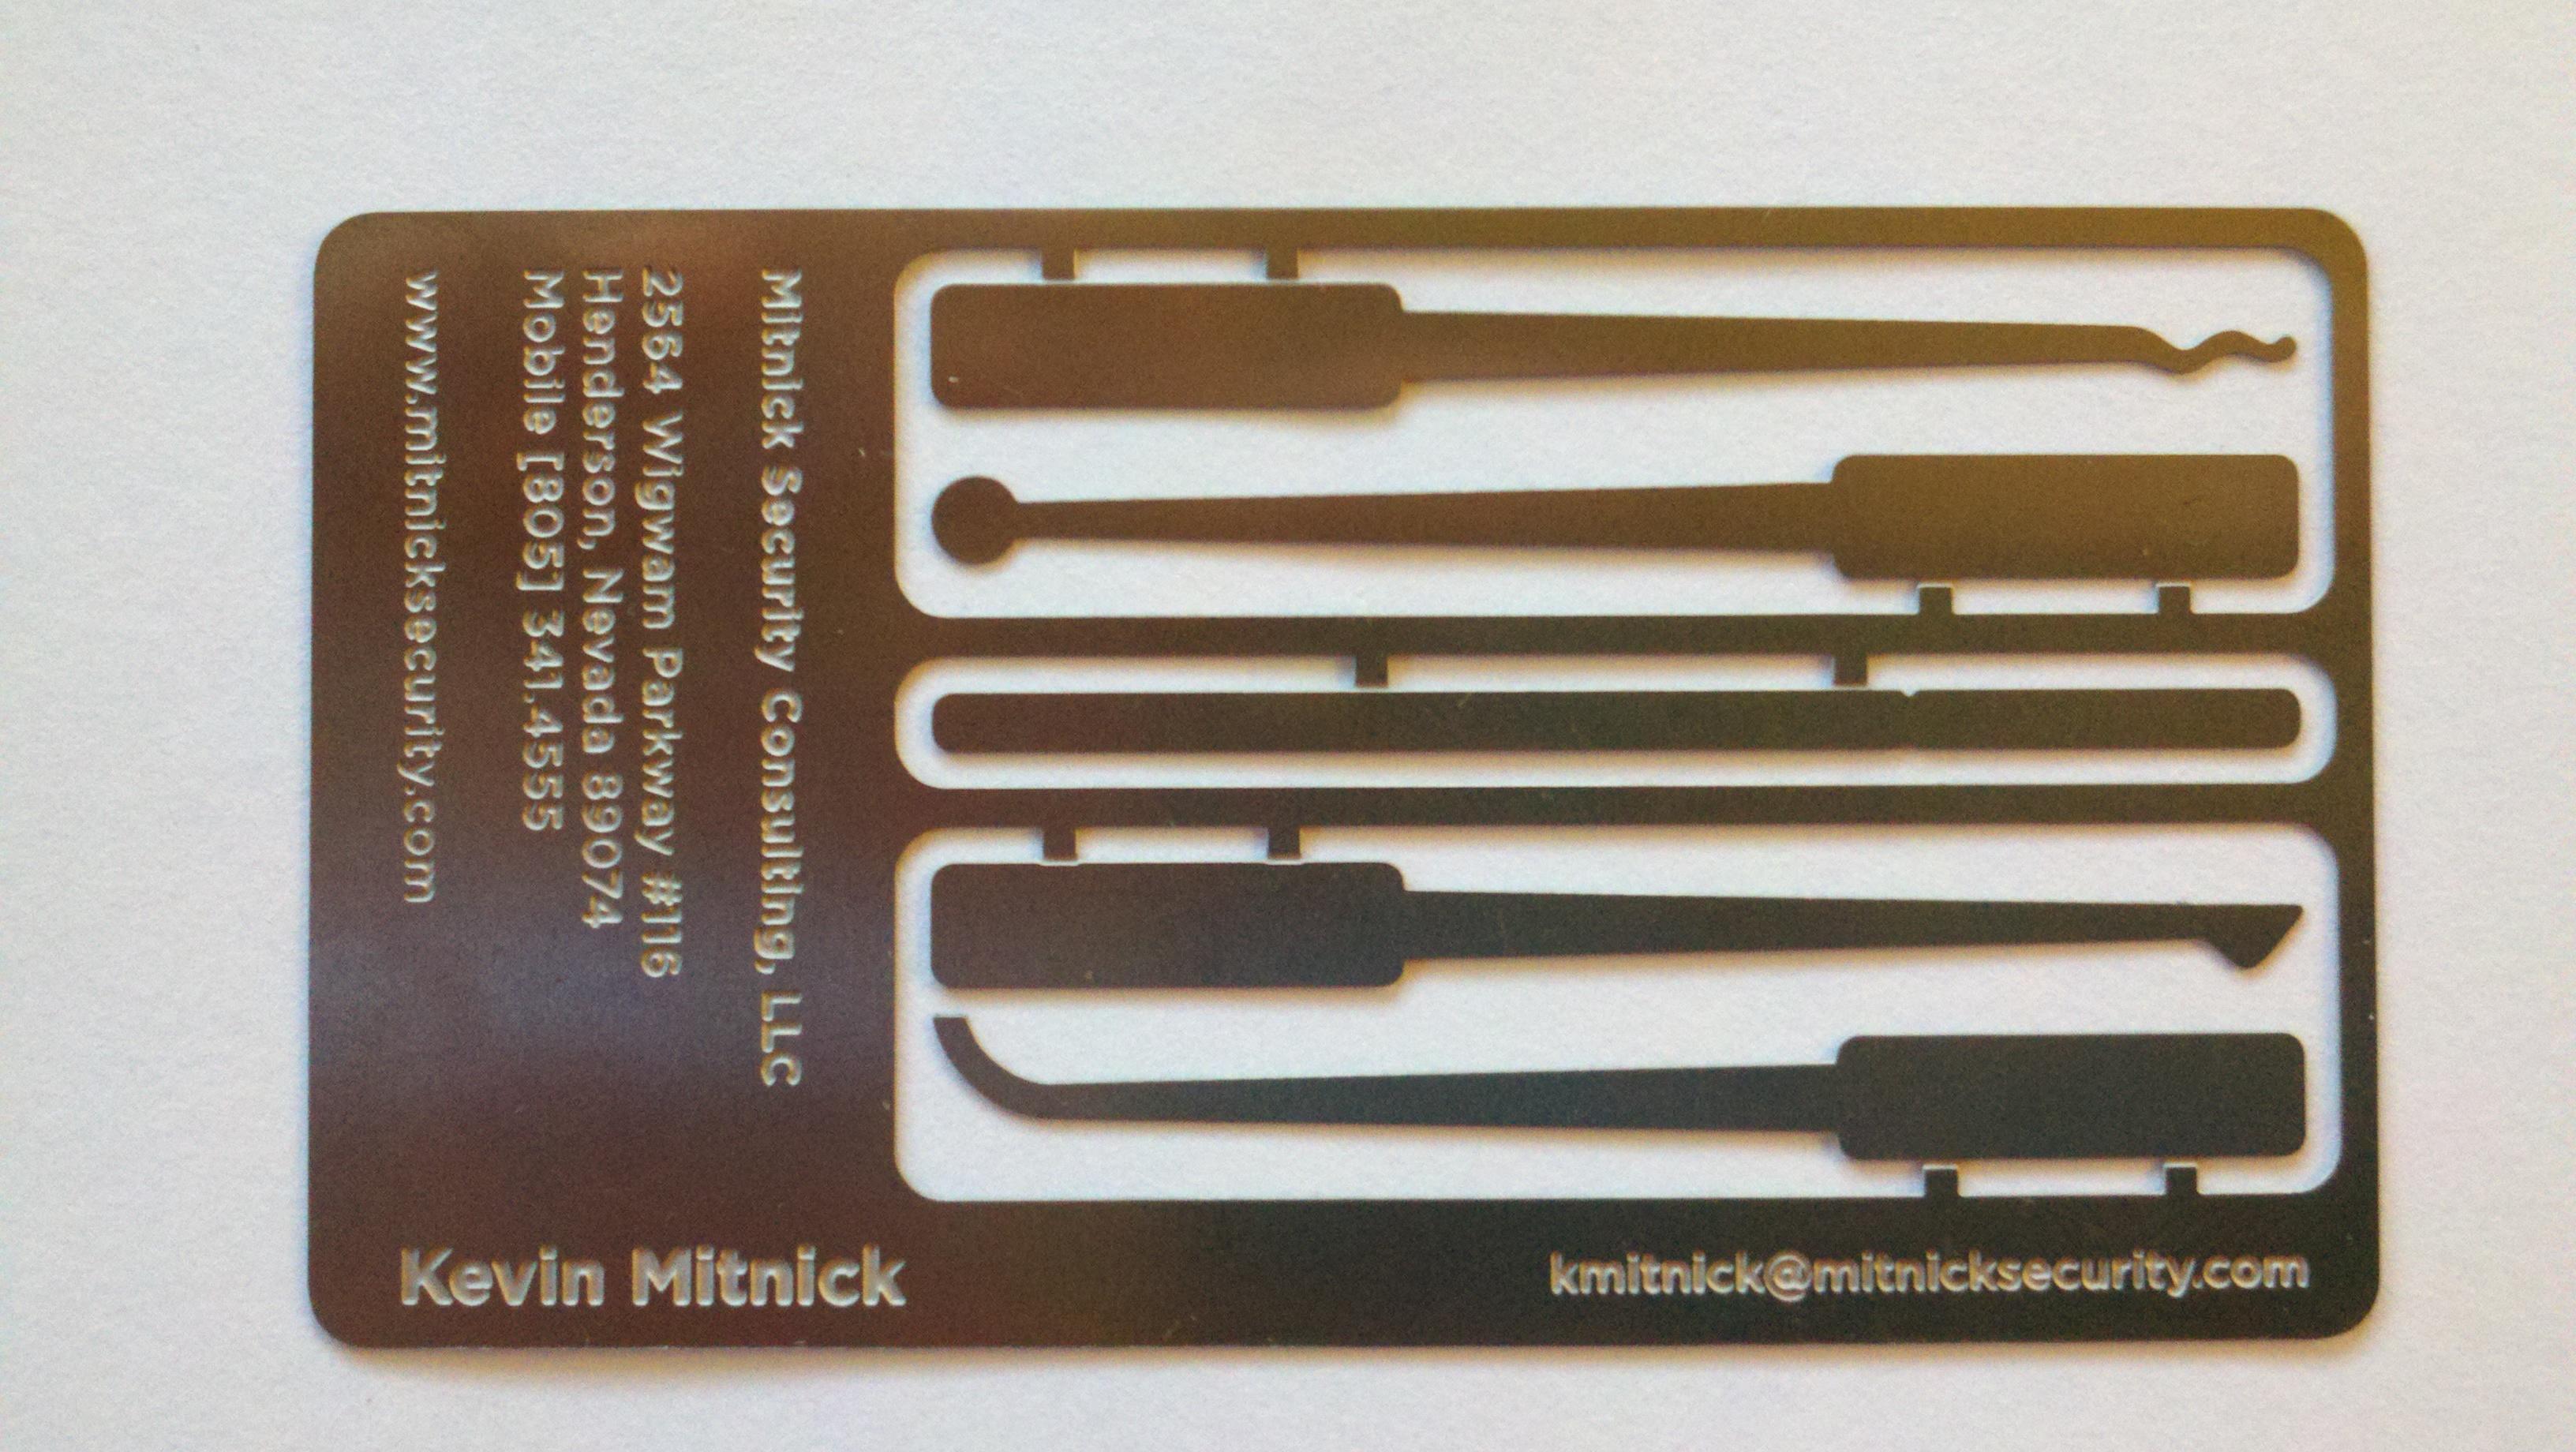 Kevin Mitnick has a business card lock-picking set : lockpicking